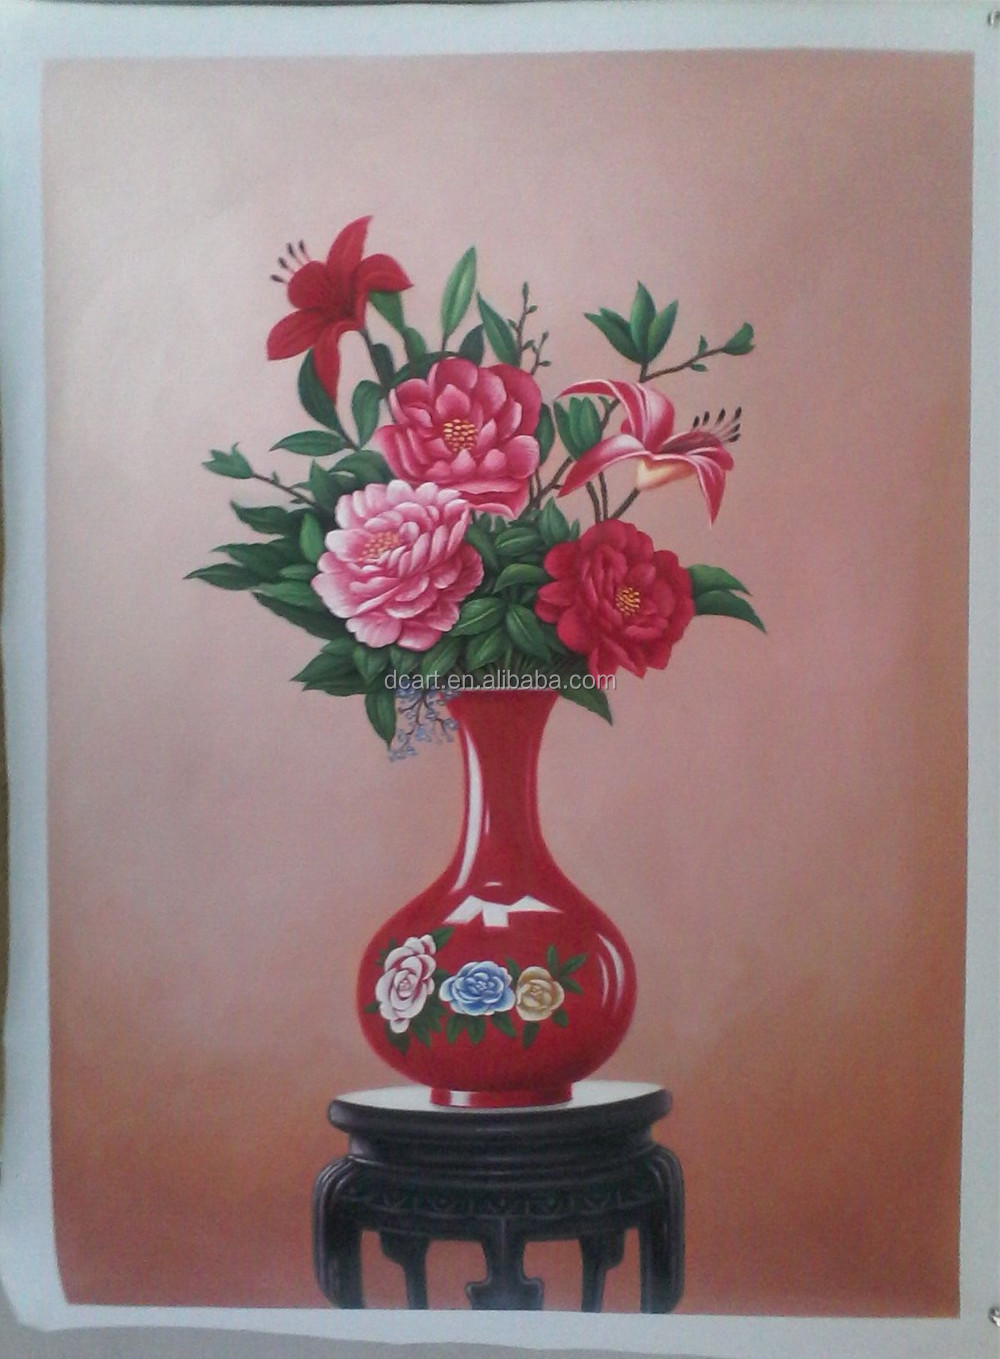 Home Deco Beautiful Flowers In Vase Oil Painting Buy Oil Painting